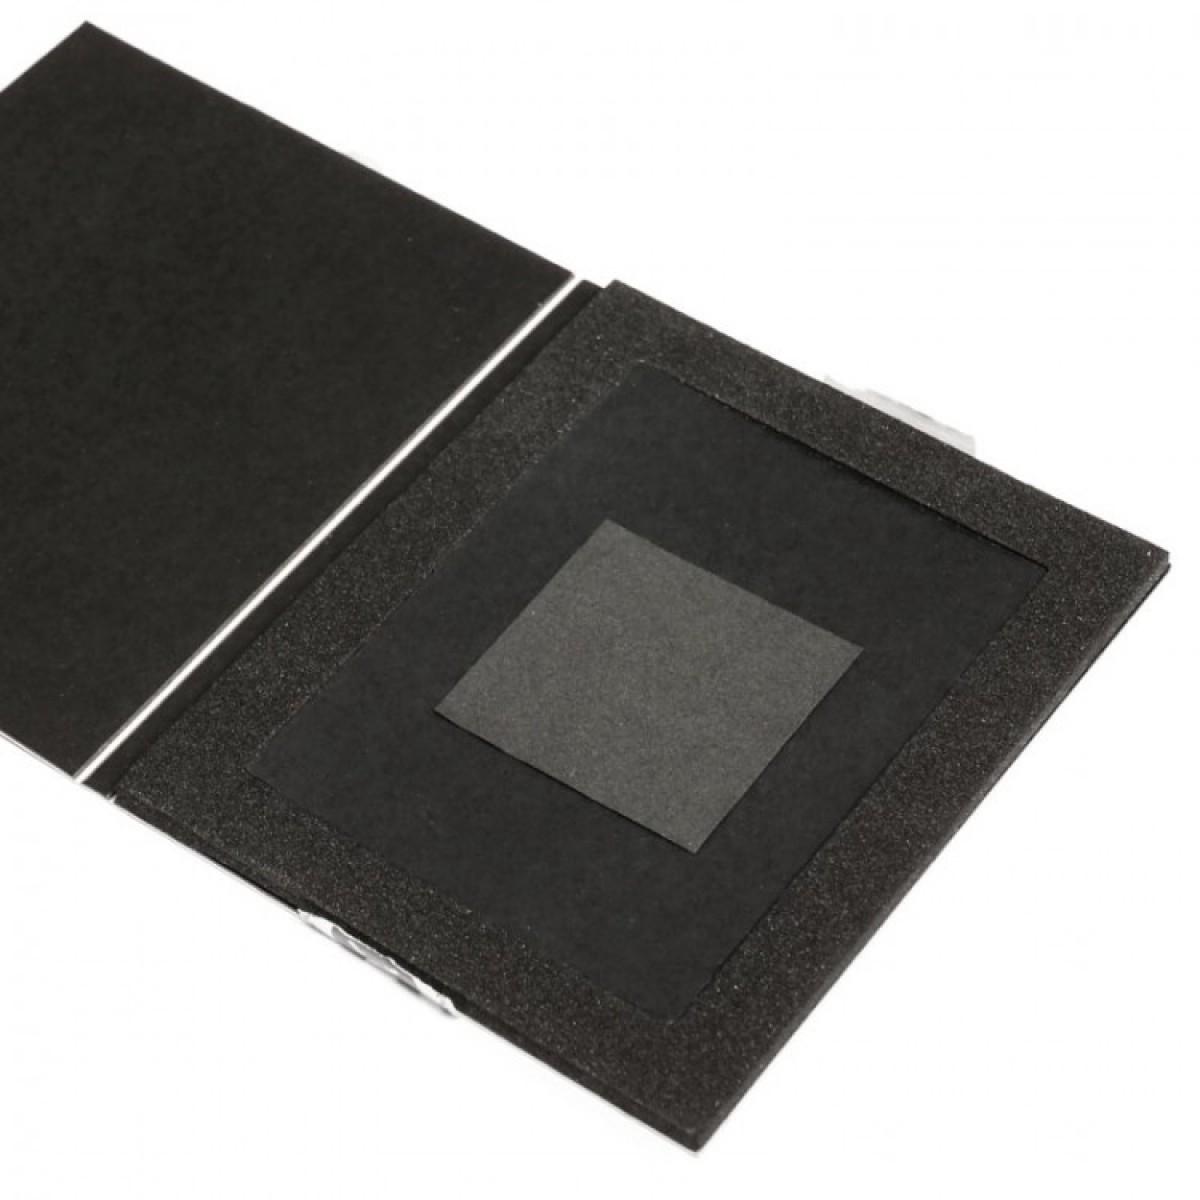 Pad Térmico Thermal Grizzly Carbonaut, 32mm x 32mm, TG-CA-32-32-02-R